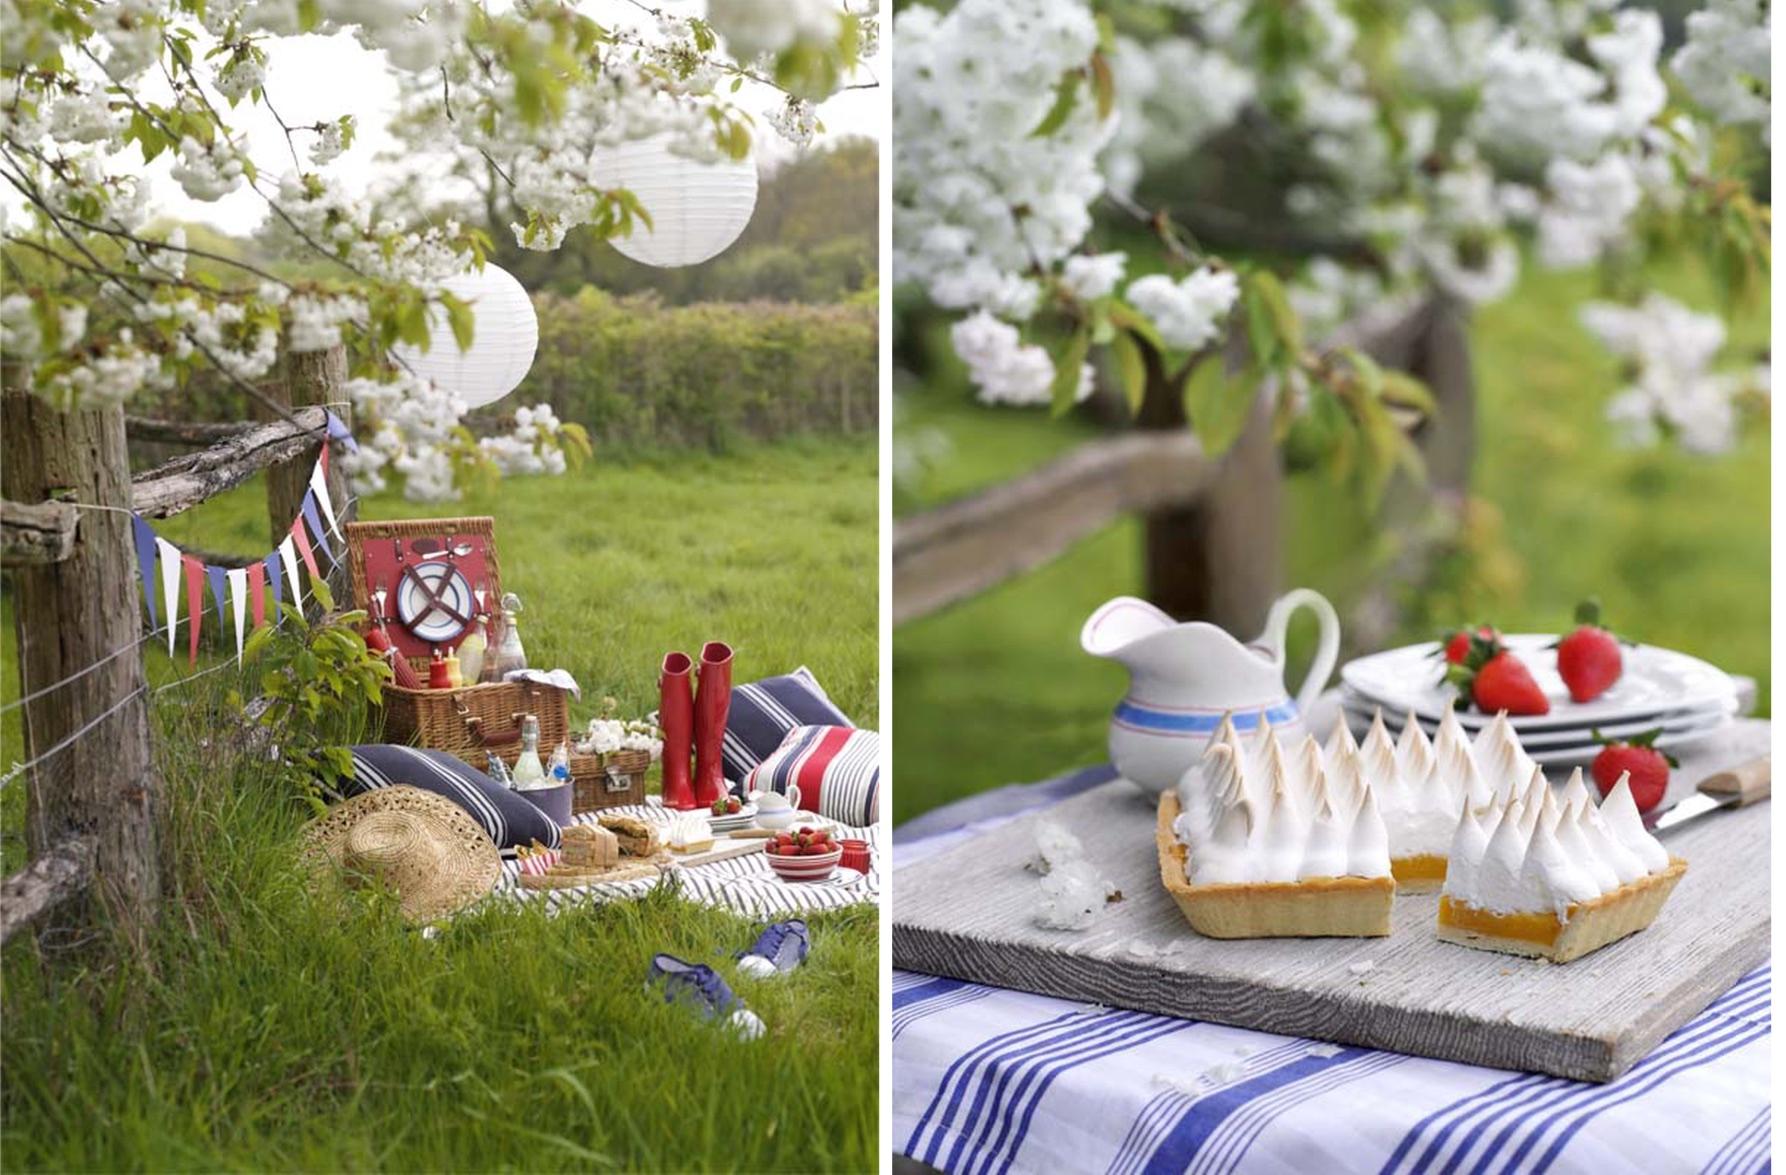 picnic 1 web .jpg